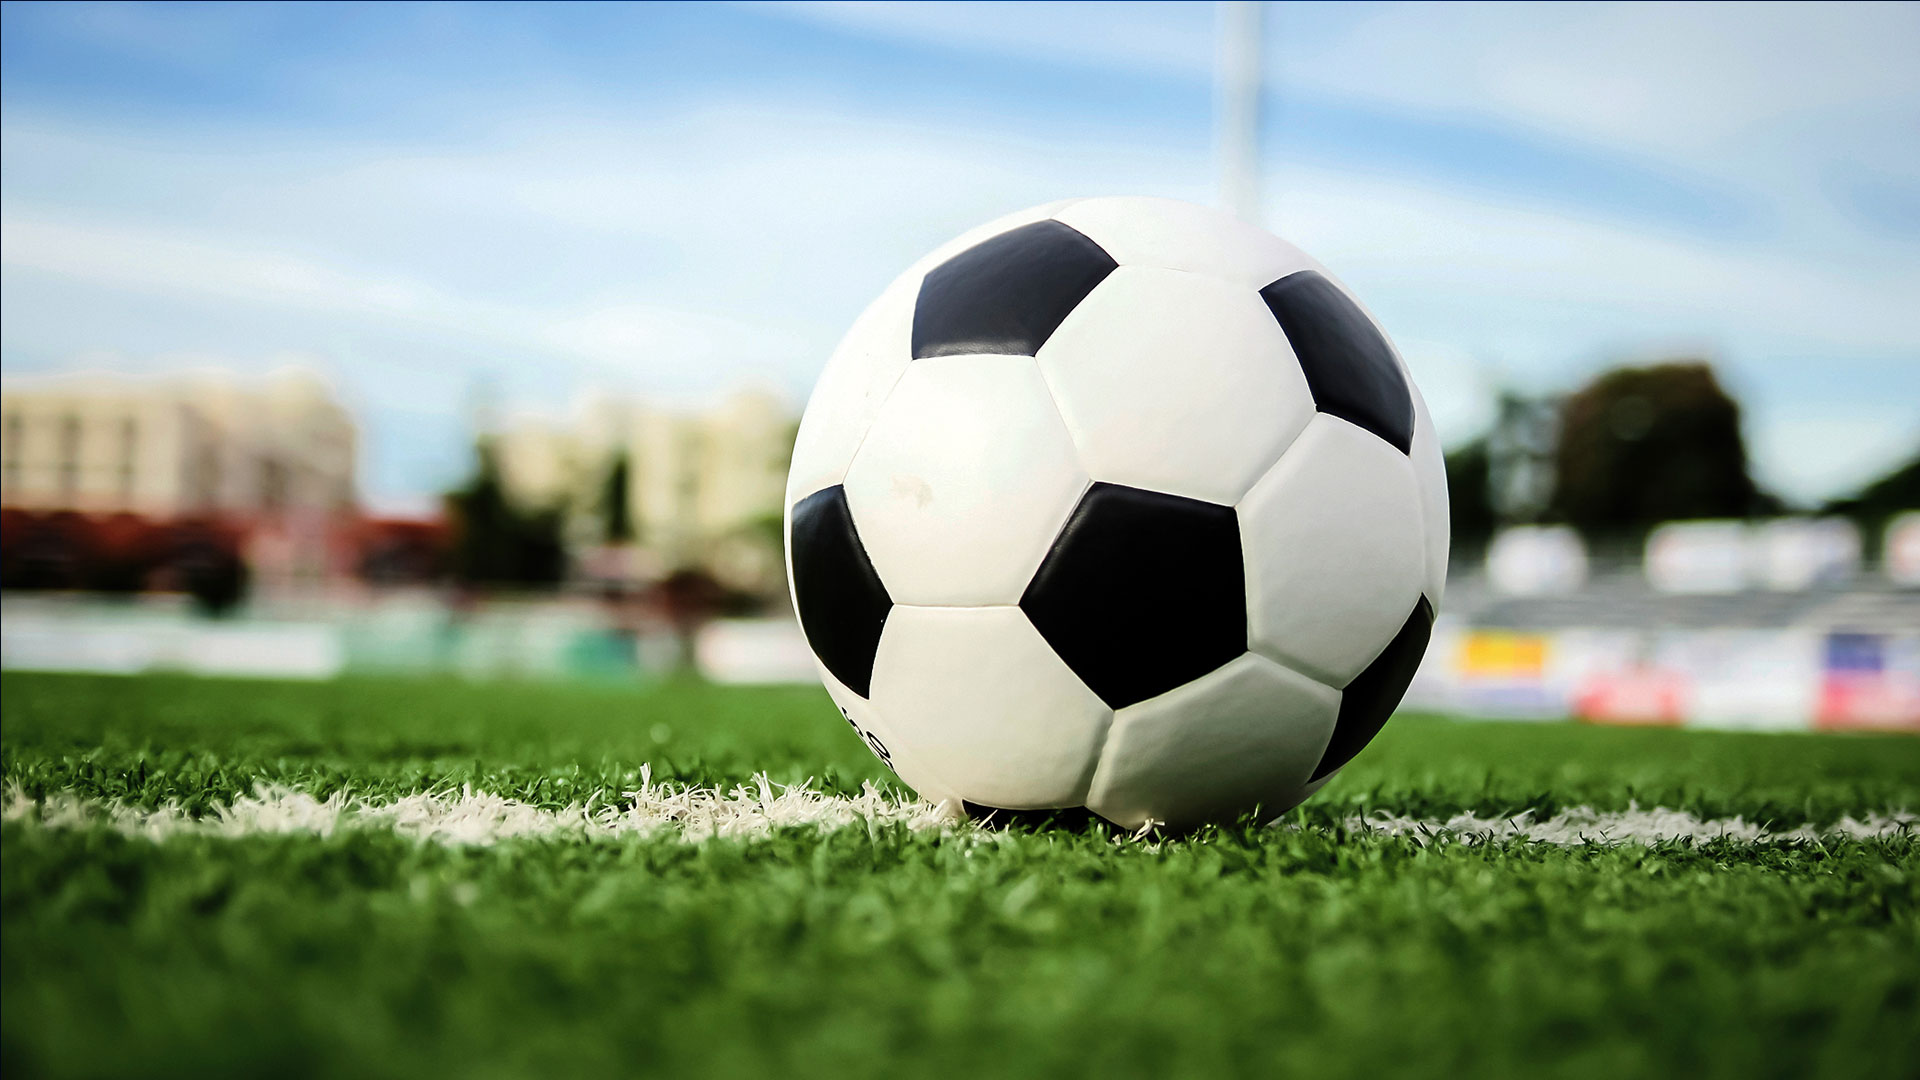 KELO-sports-generic-soccer_1529437988841.jpg